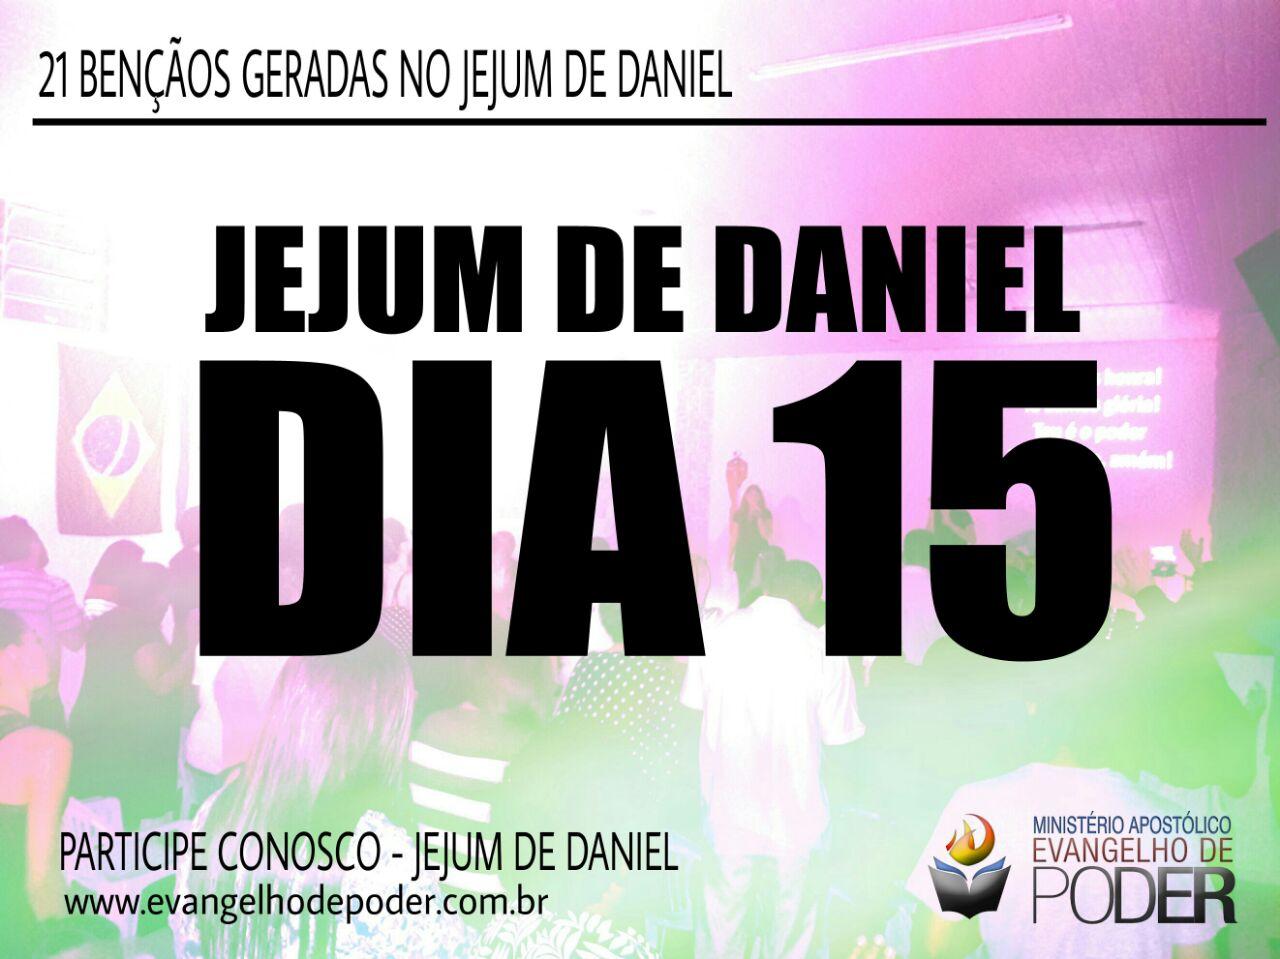 JEJUM DE DANIEL 15° DIA